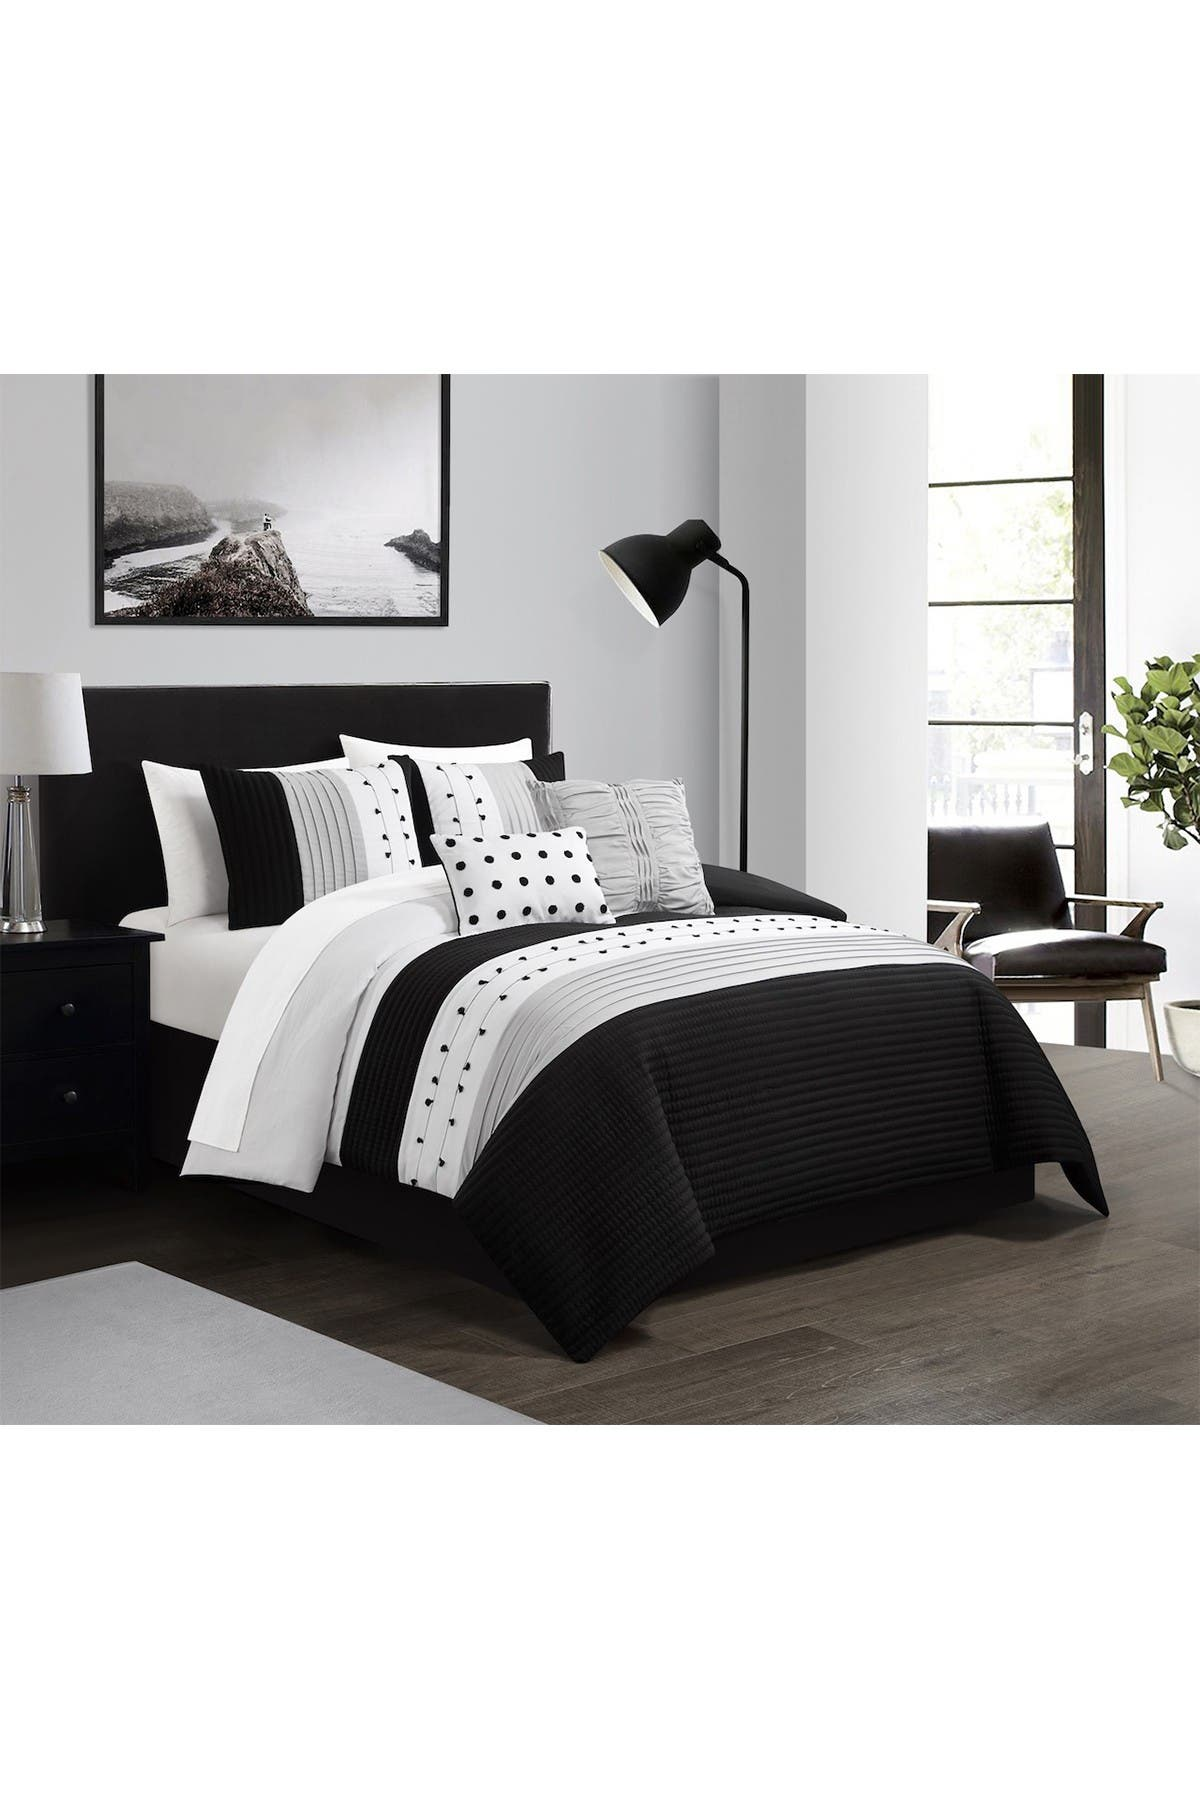 Chic Home Bedding Lannie Color Block Pleated Embroidered Design Queen Comforter Set Black 5 Piece Set Nordstrom Rack